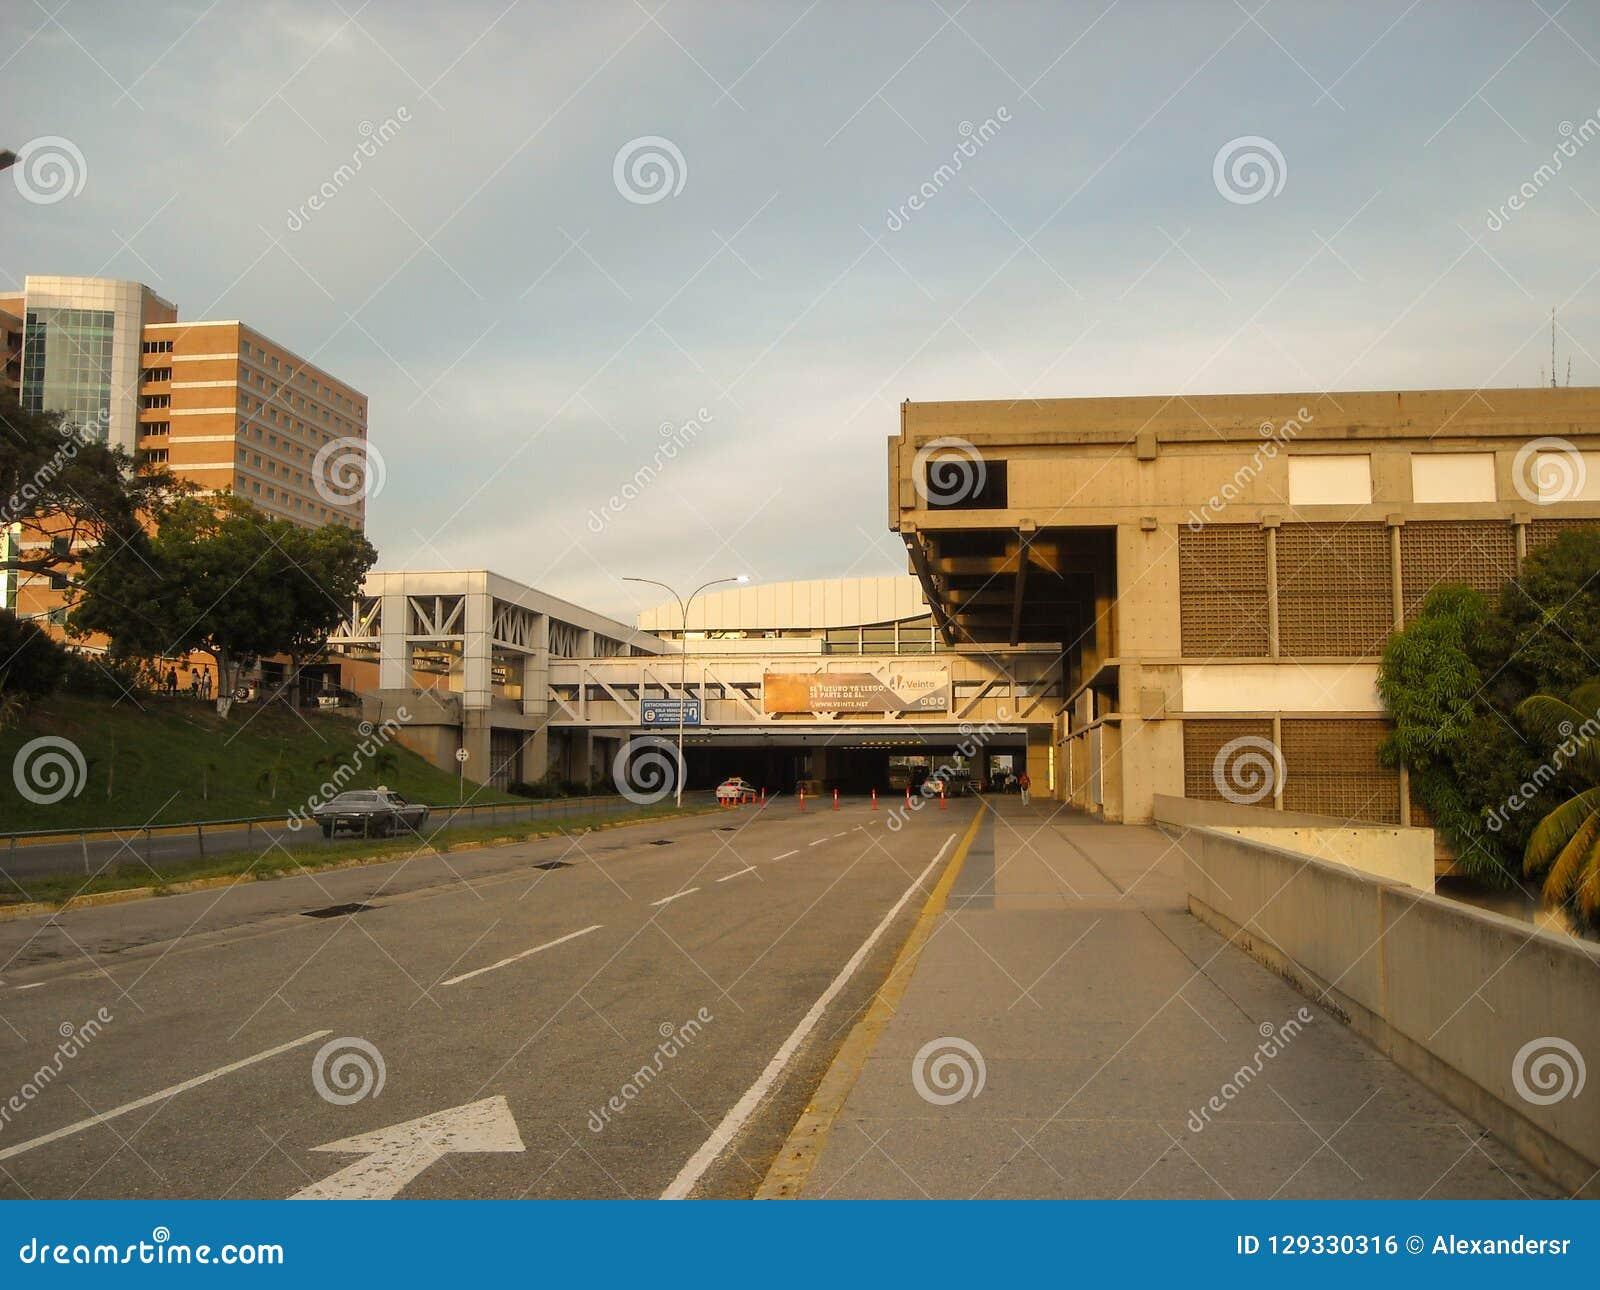 Estado/Venezuela de Guaira Vargas do La 08/11/2018 de aeroporto internacional Simon Bolivar Maiquetia Editorial